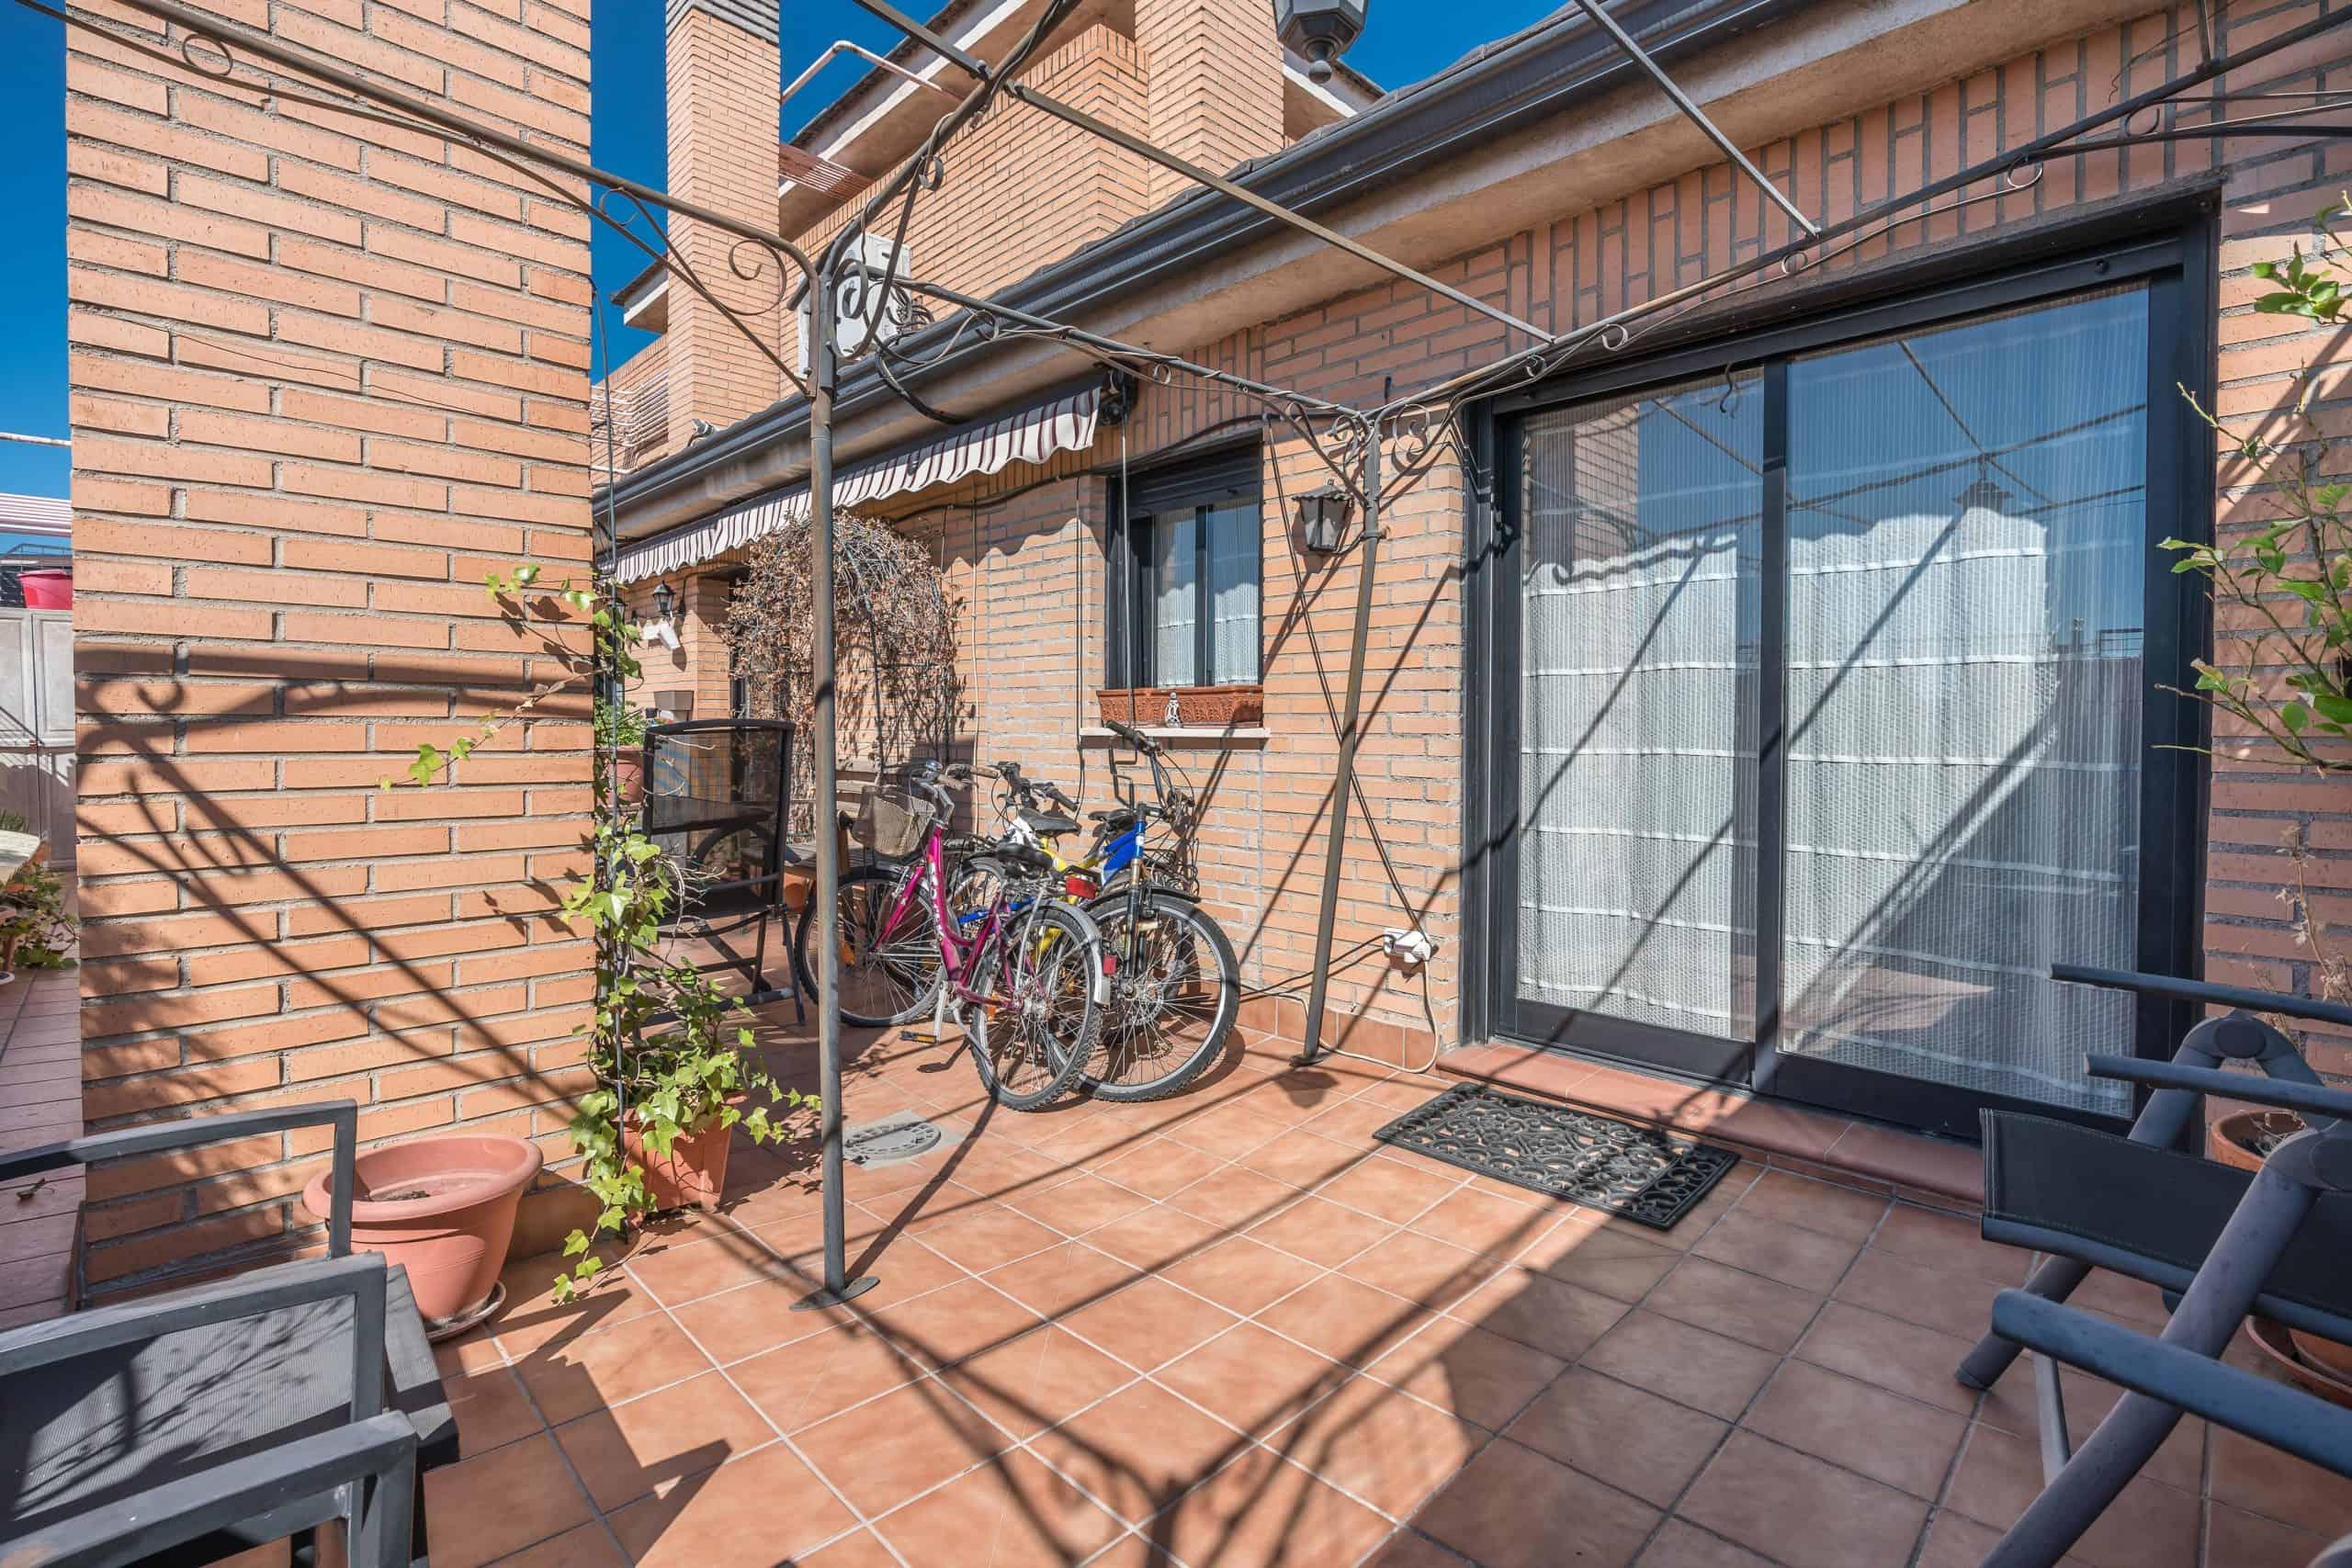 Agencia Inmobiliaria de Madrid-FUTUROCASA-Zona ARGANZUELA-EMBAJADORES-LEGAZPI2 TERRAZA (5)